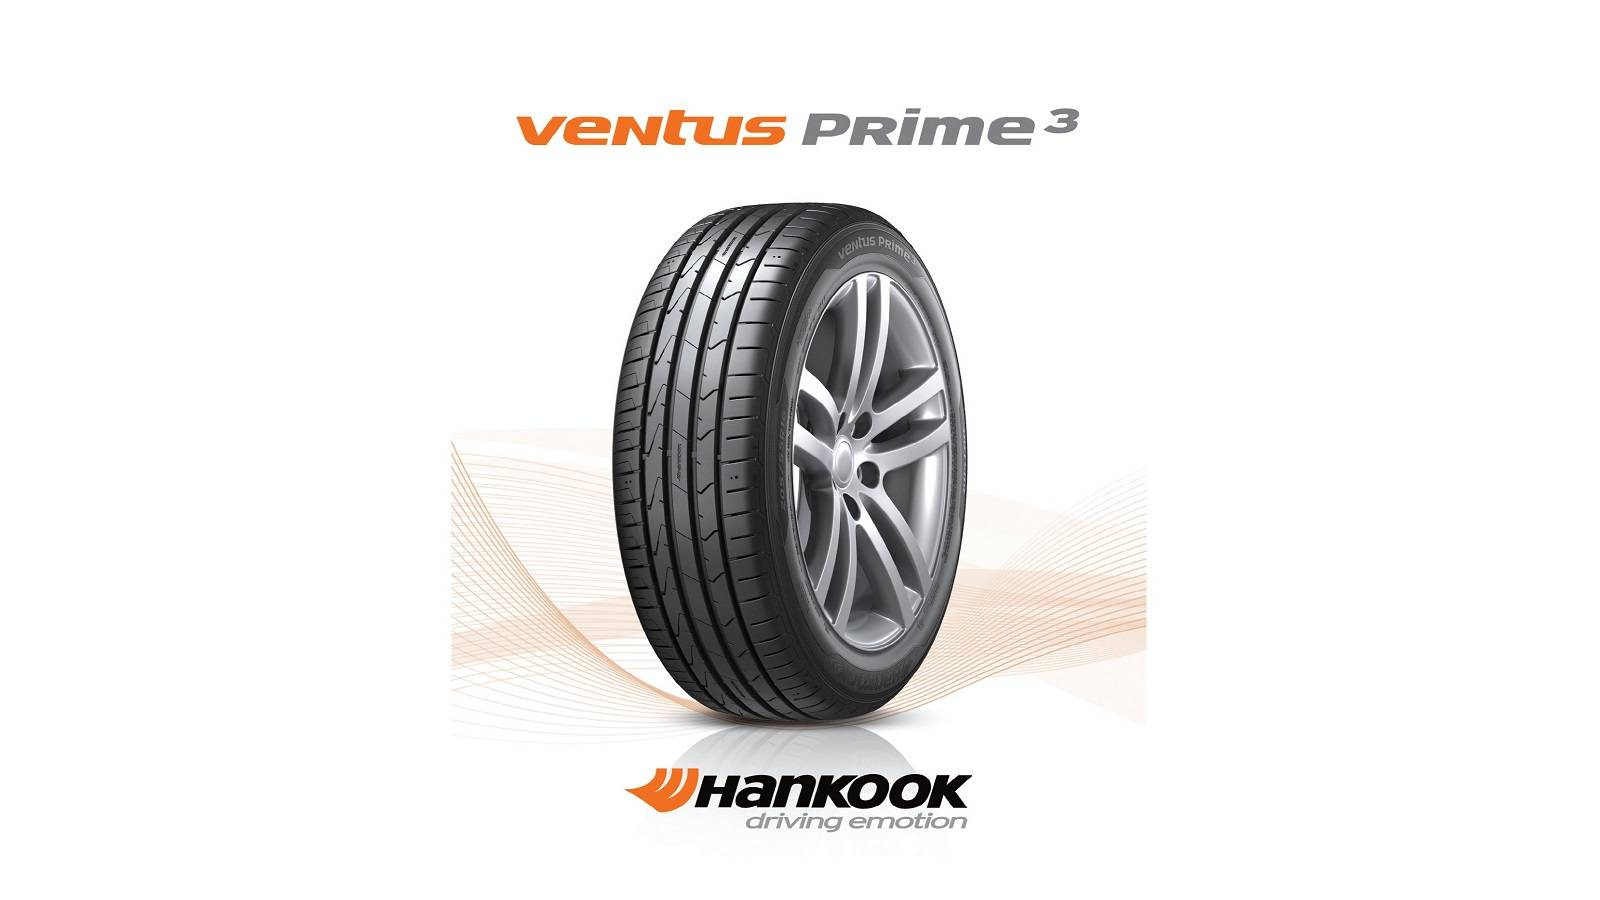 Hankook yeni Ford Focus Active'i Ventus Prime 3 ile donatıyor